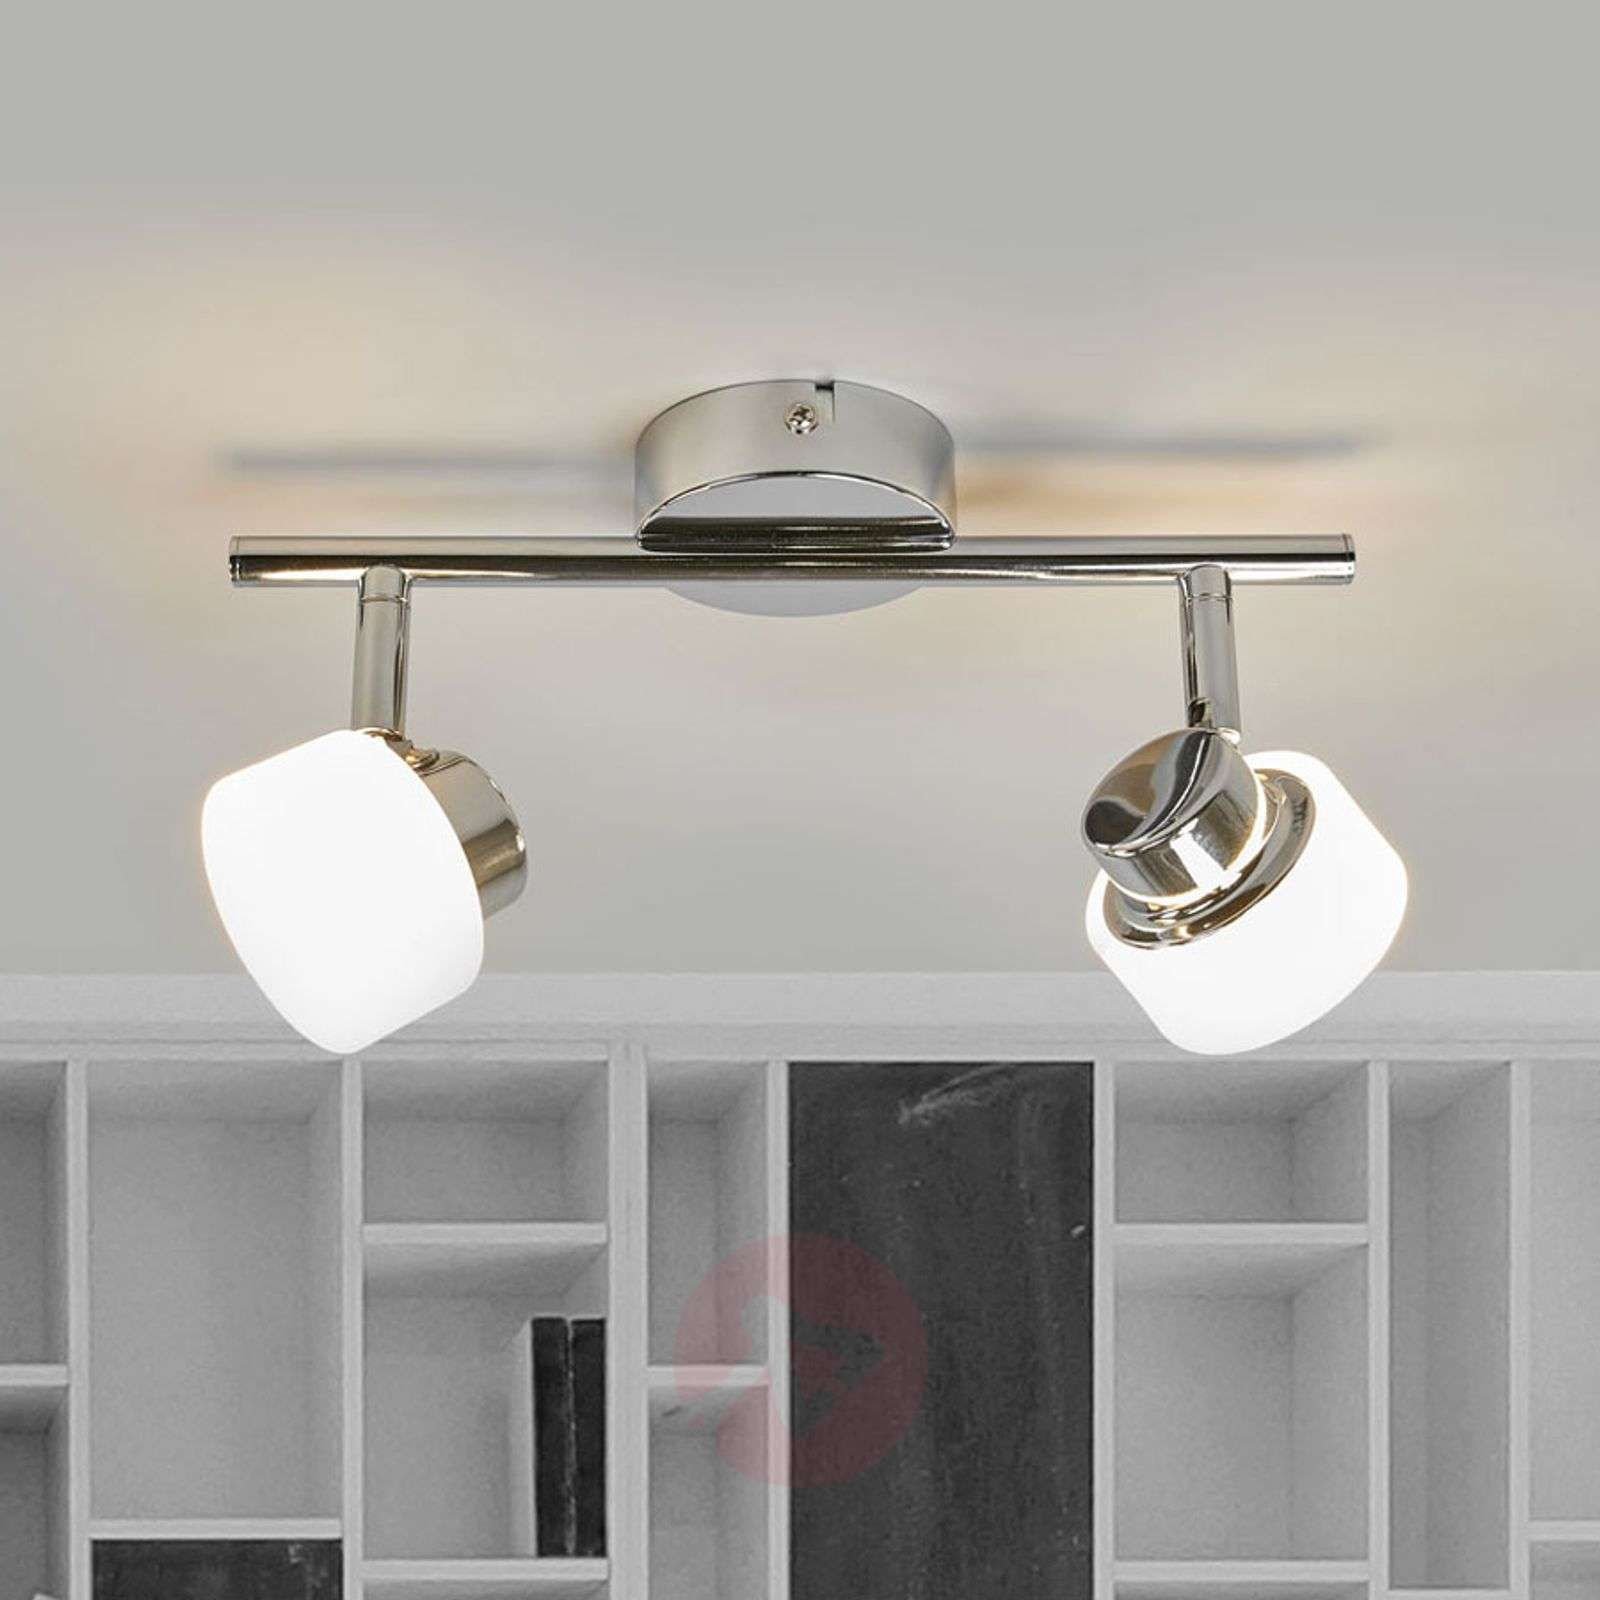 Adjustable LED ceiling lamp Shia, chrome-plated-9954007-01